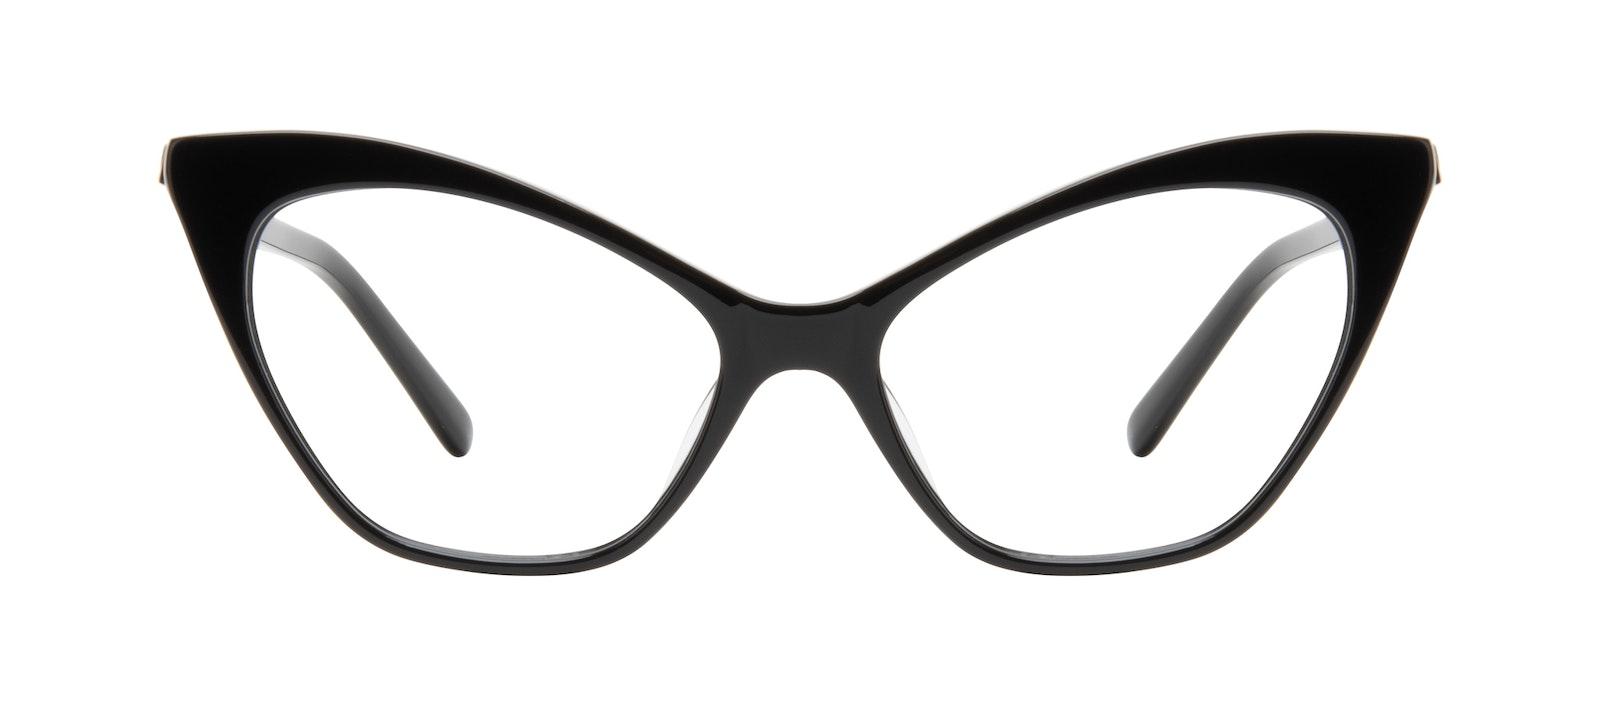 Affordable Fashion Glasses Cat Eye Eyeglasses Women Gossip Onyx Front